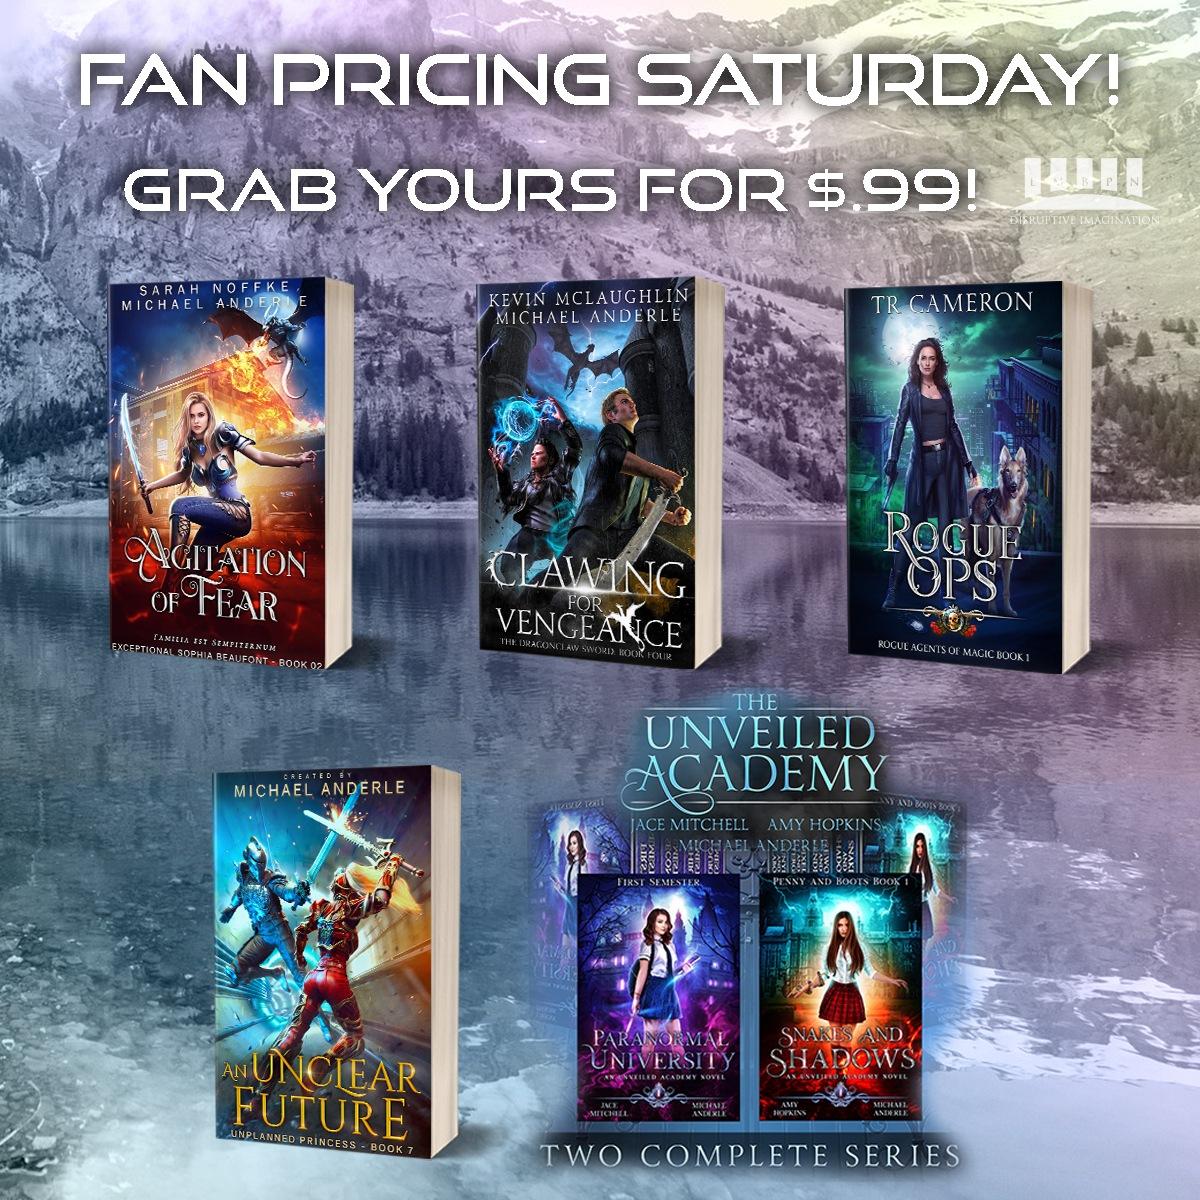 Fallin' in Love Fan's Pricing Saturday banner cover